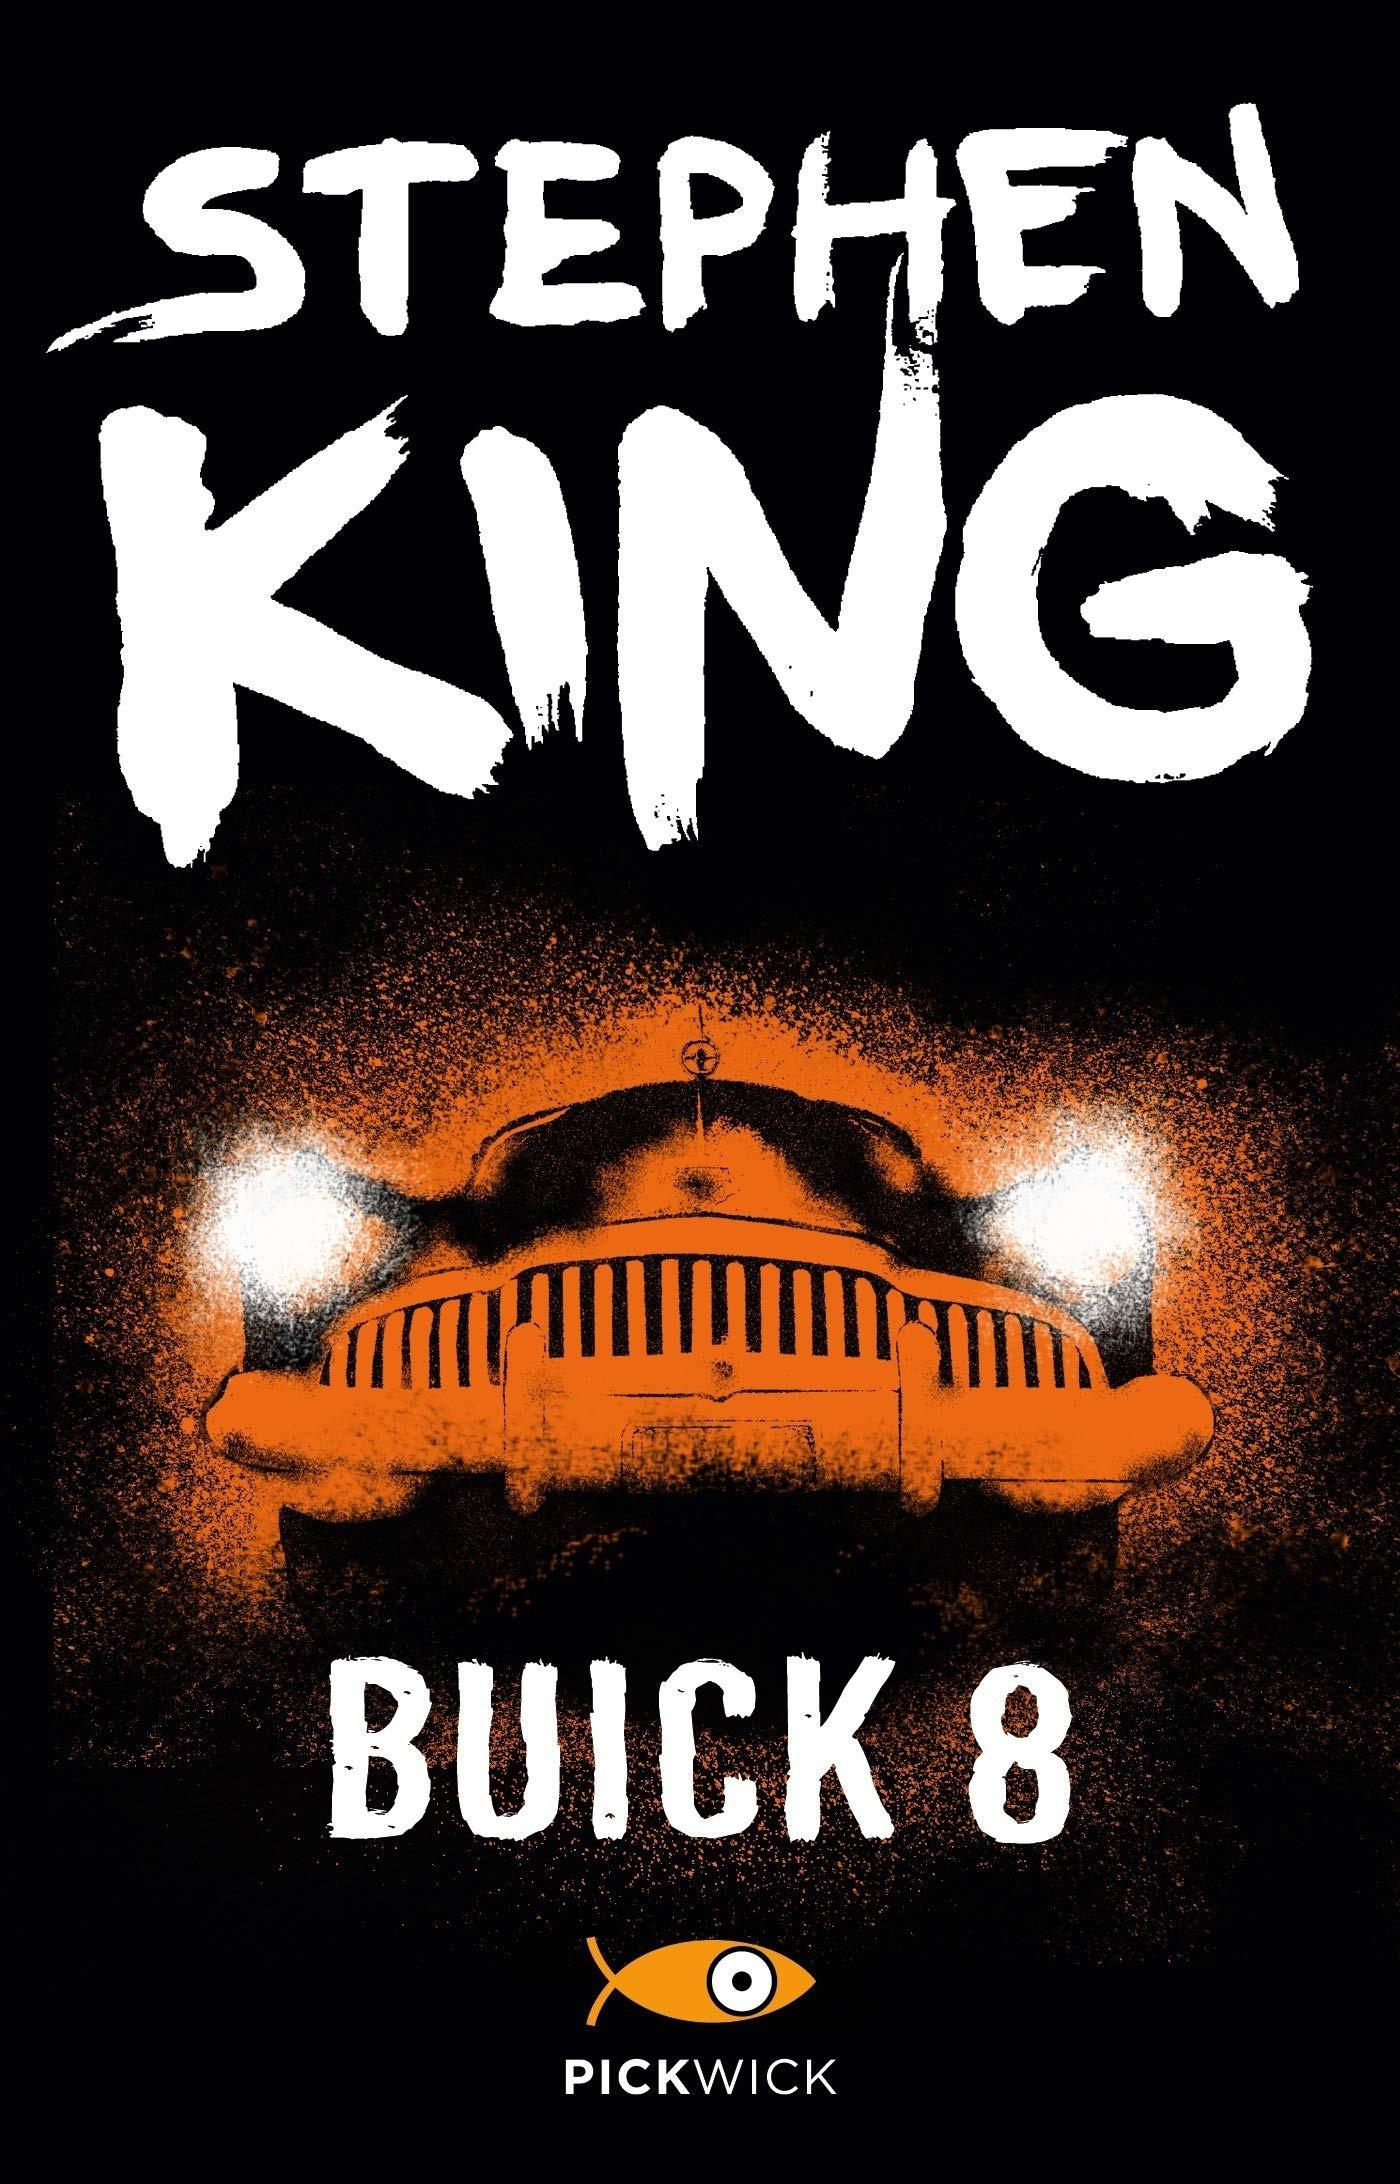 Buick 8 versione italiana Stephen King  Ebook Bookrepublic